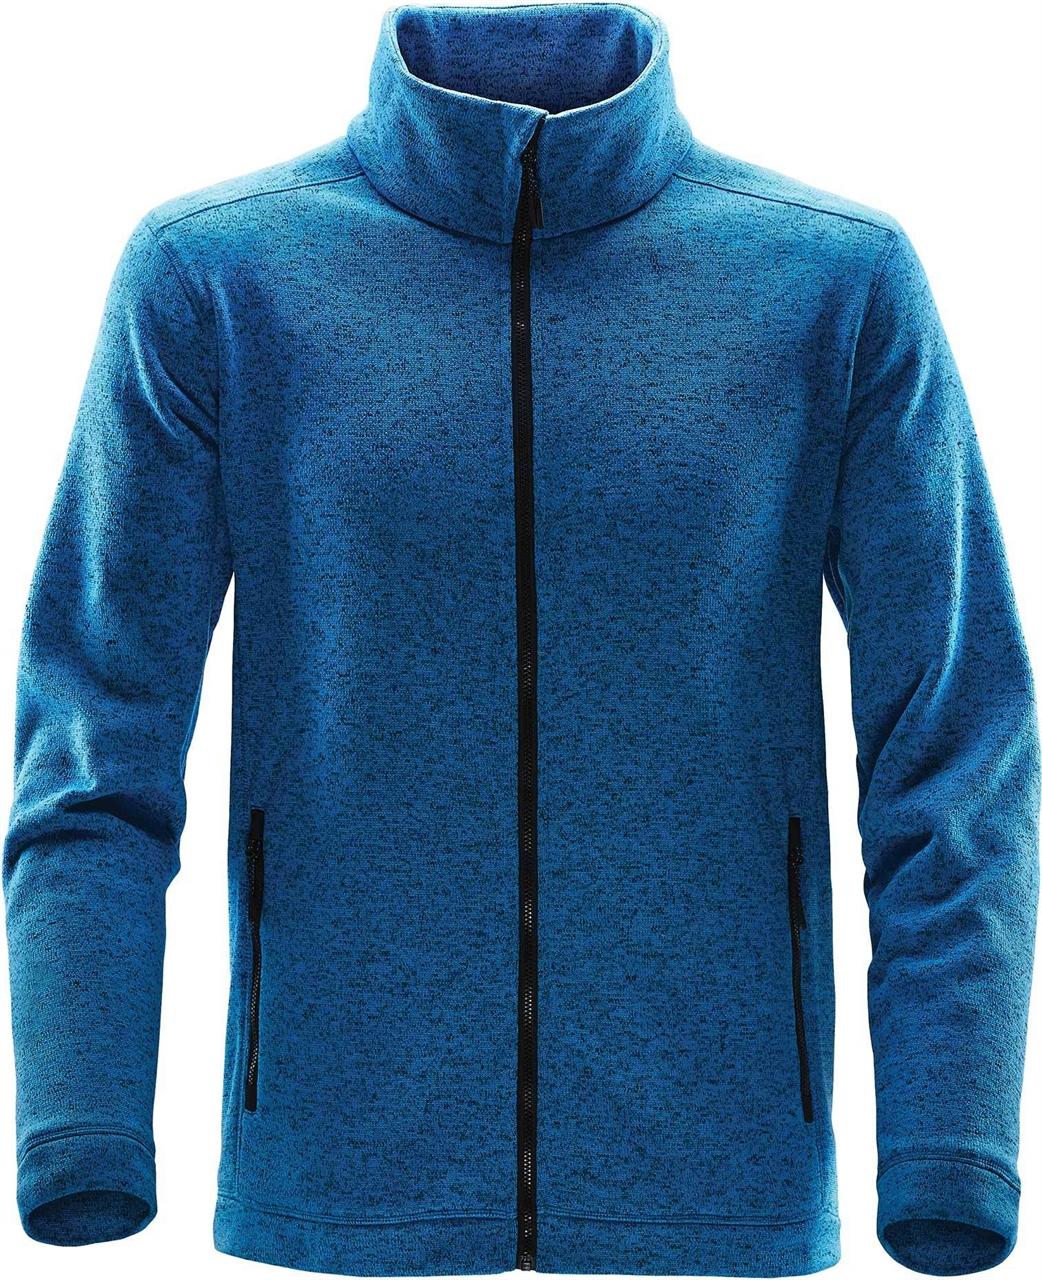 Picture of STORMTECH Tundra Sweater Fleece Jacket